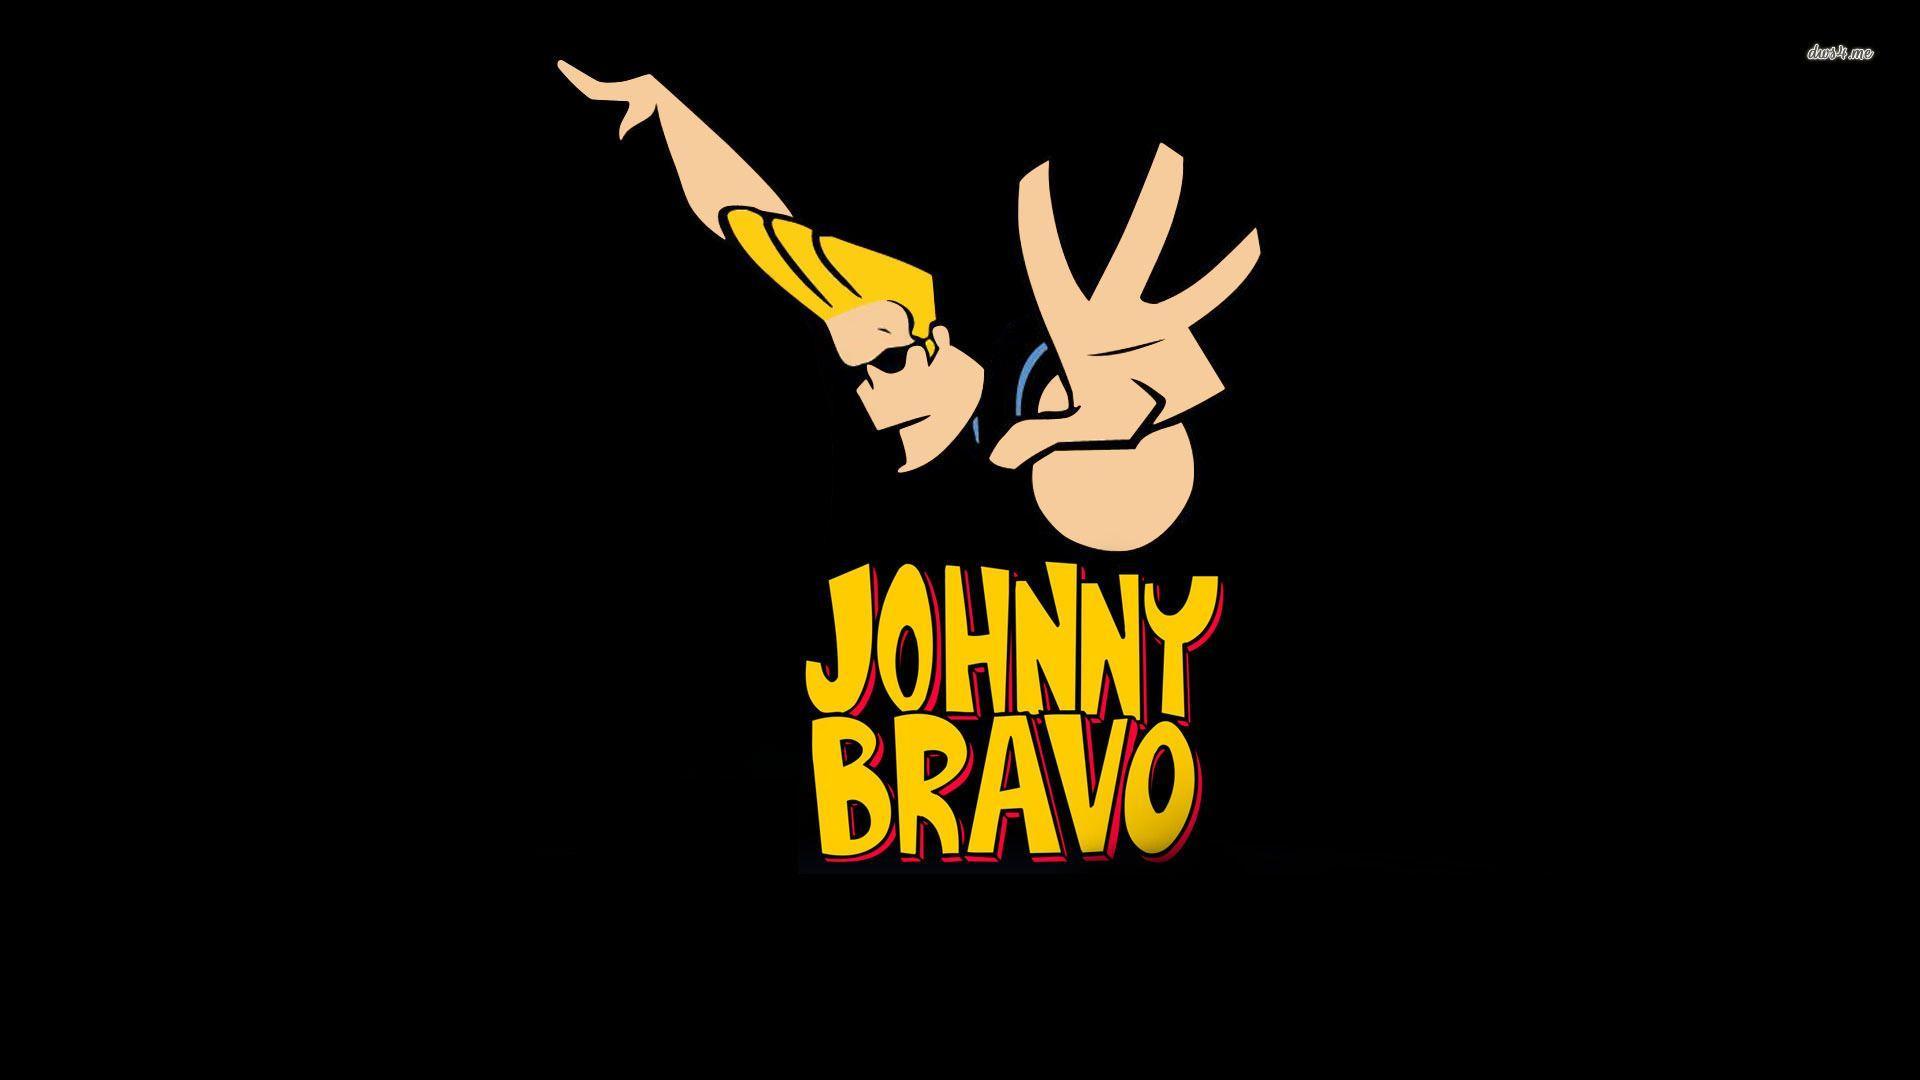 4787-johnny-bravo-1920x1080- ...